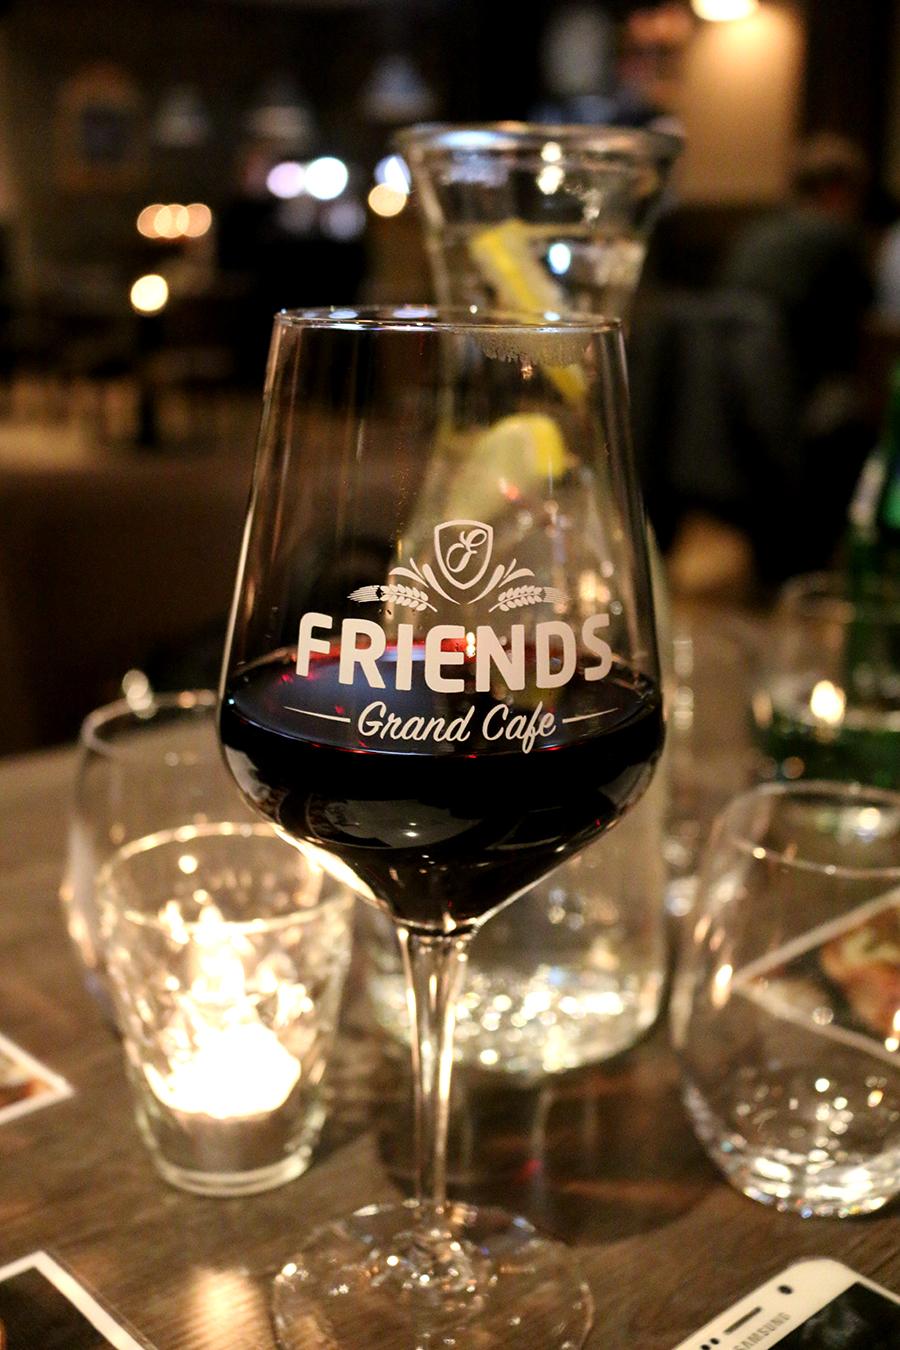 Eten in Sint Anthonis: Foodsharing bij Grand Café Friends